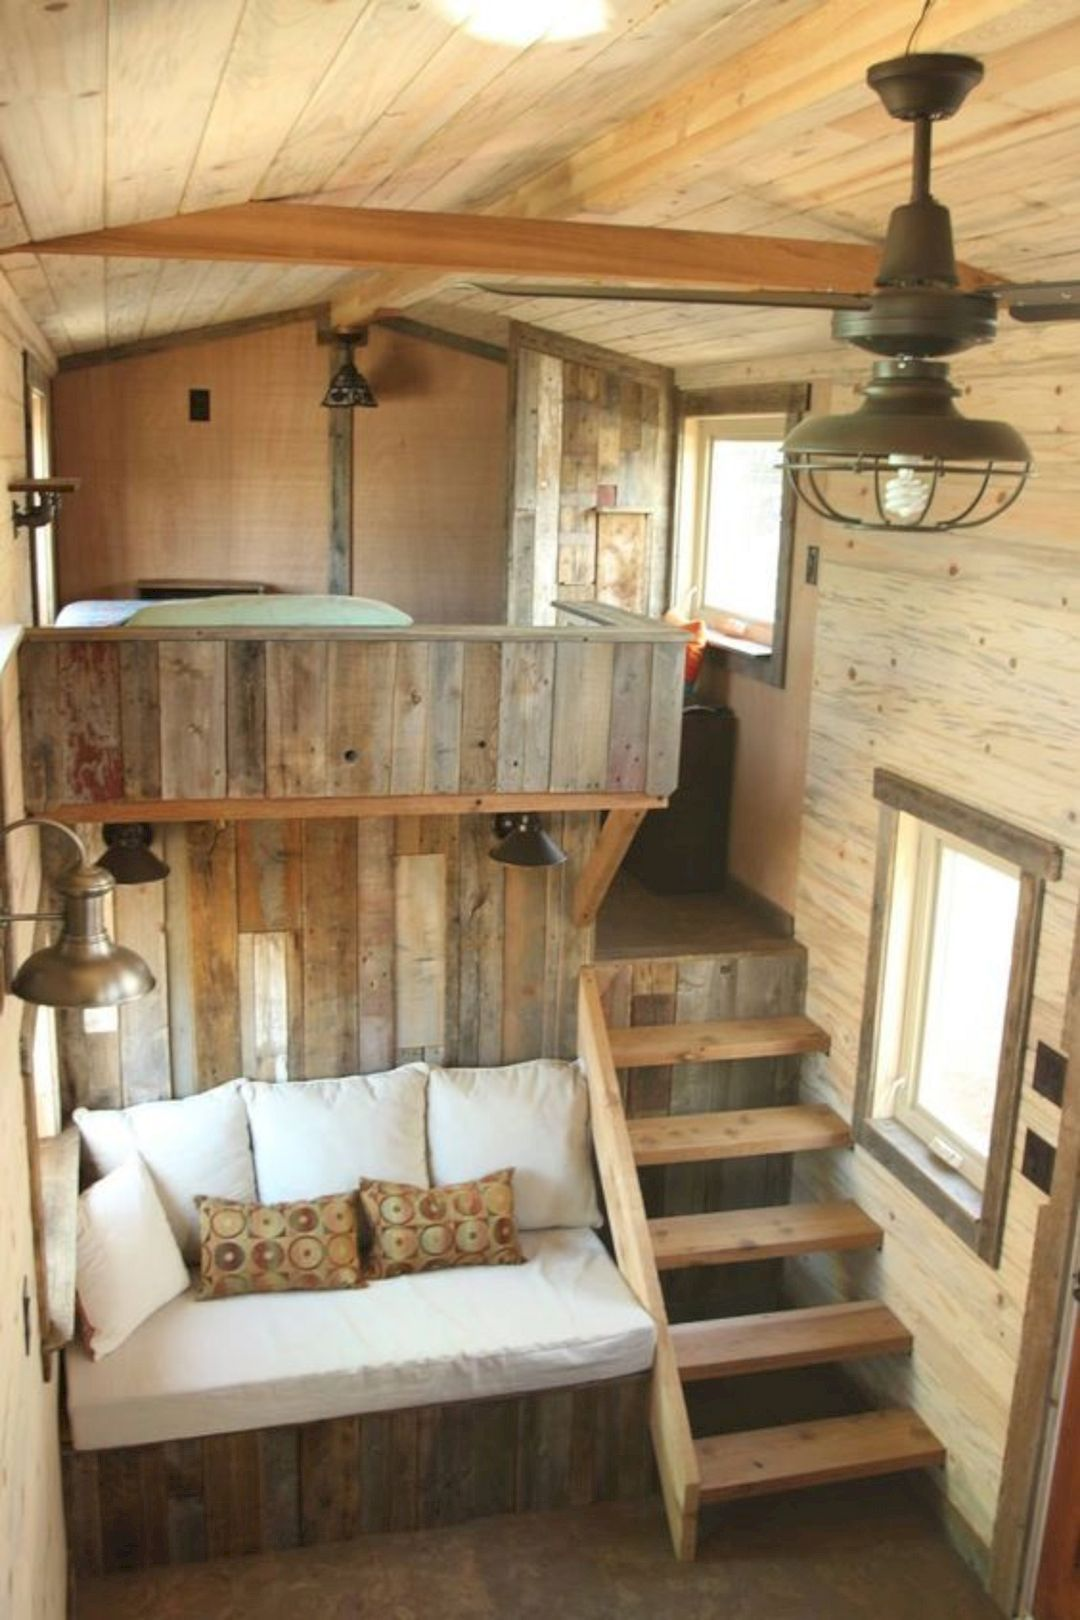 16 Tiny House Interior Design Ideas Tiny House Cabin Tiny House Interior Design Tiny House Interior